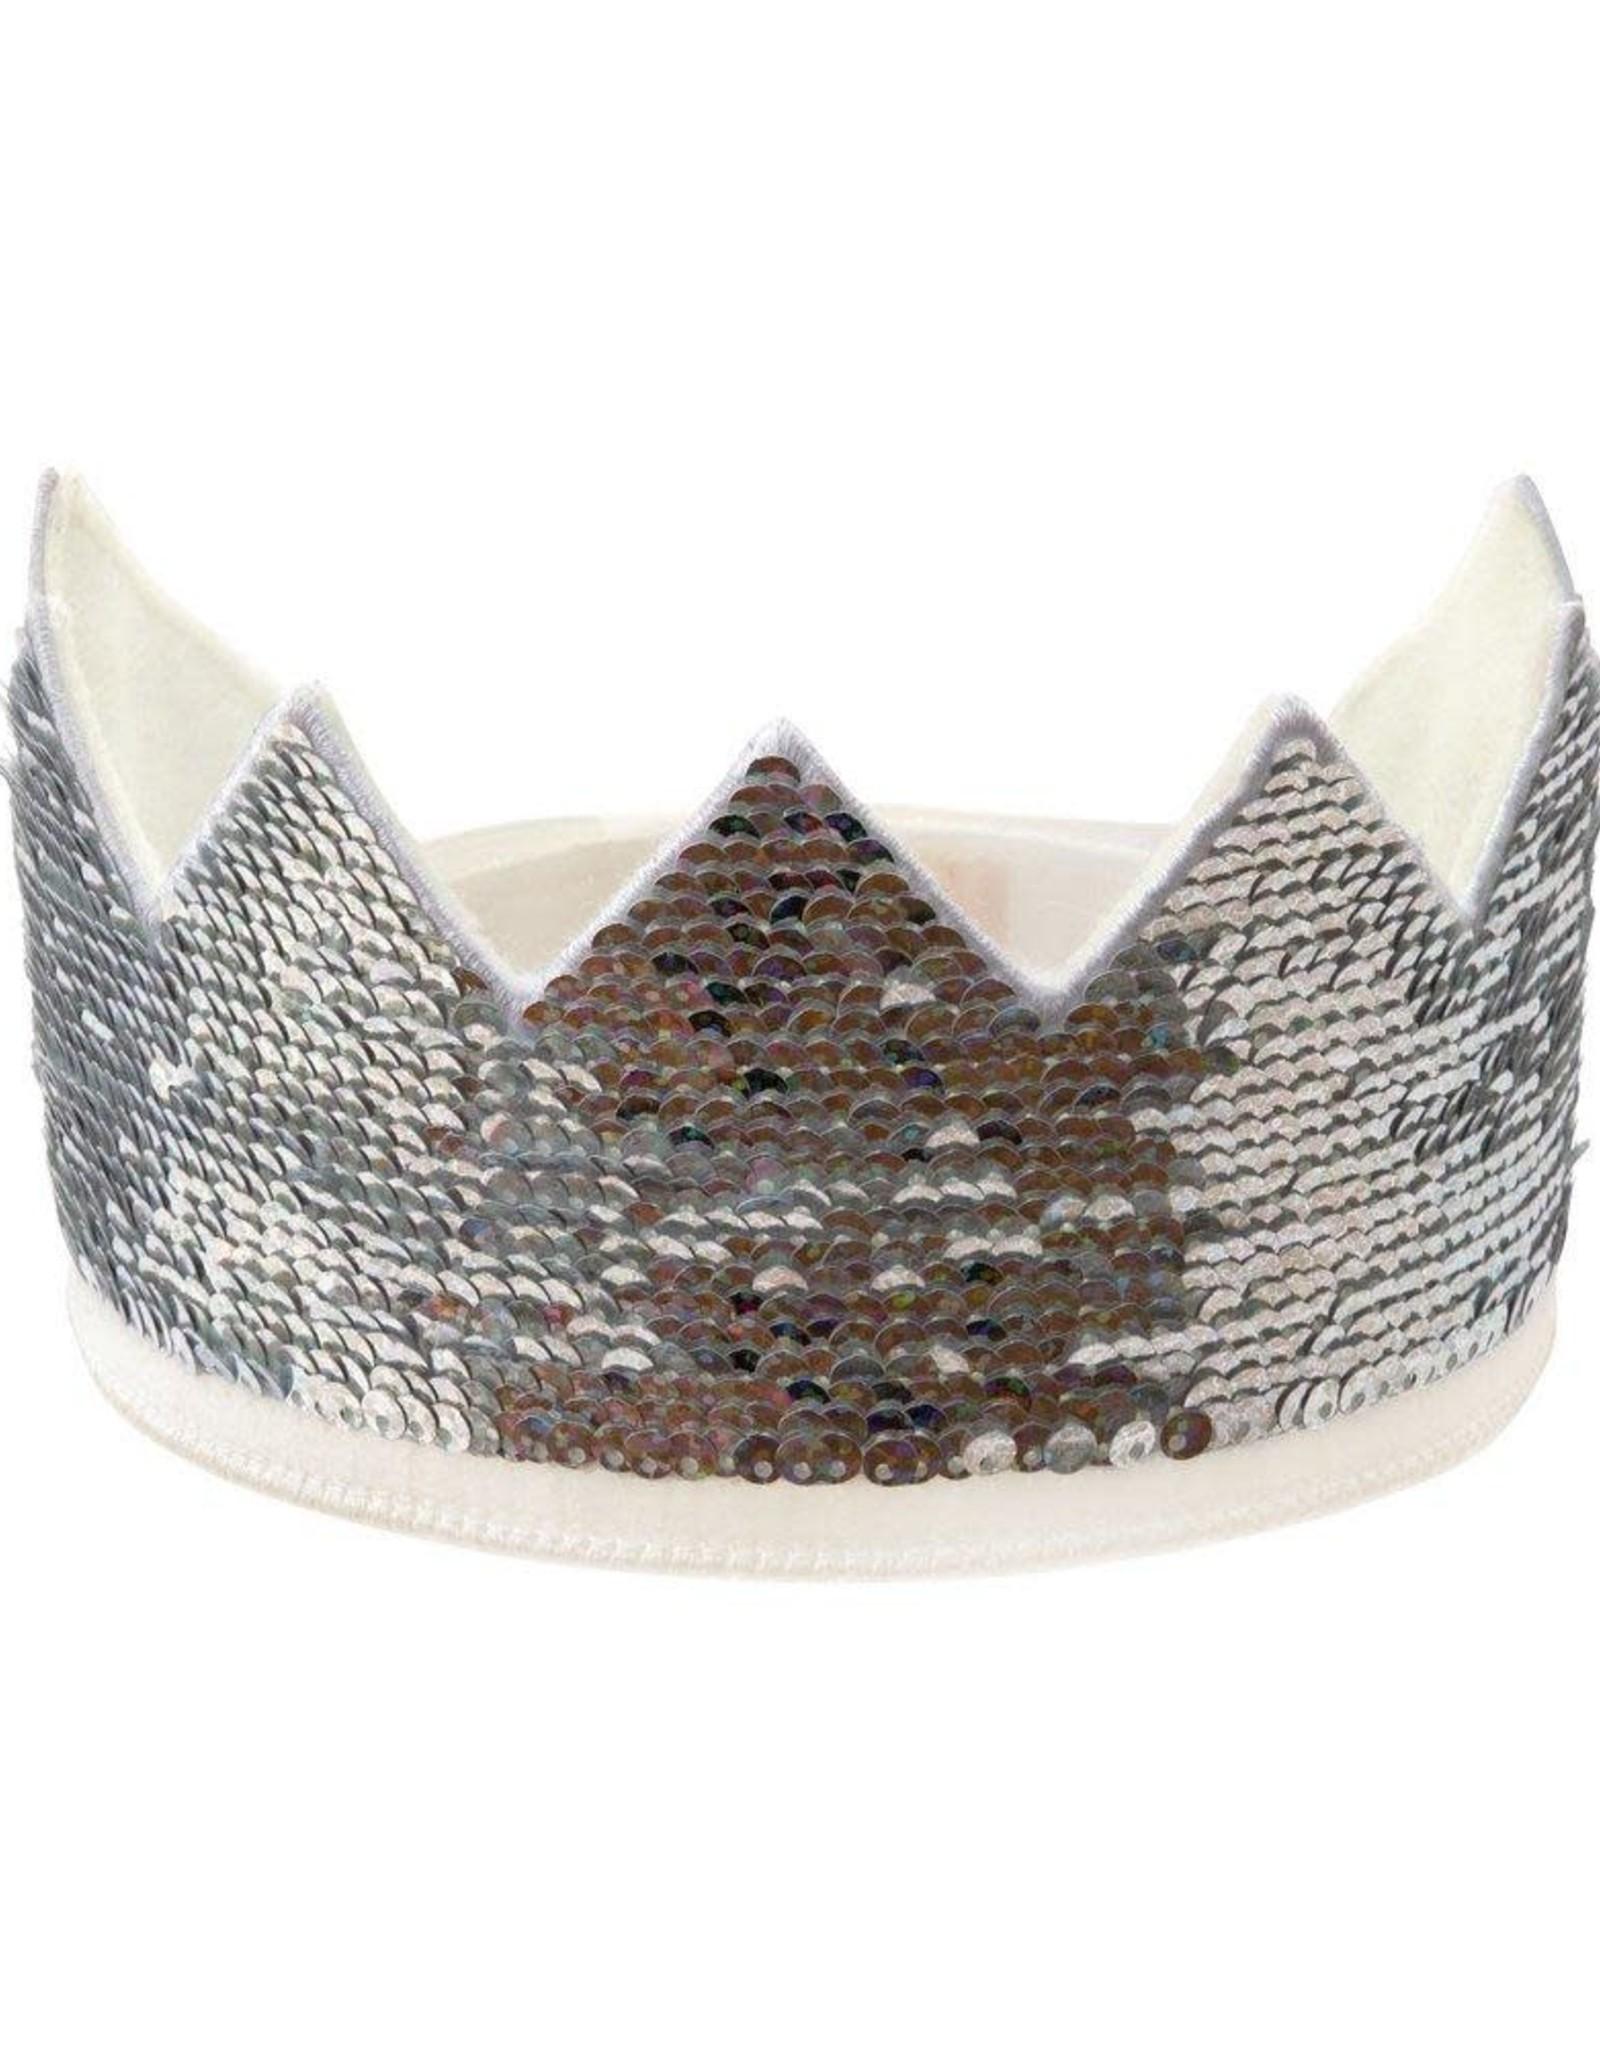 Meri Meri reverse sequin party crown